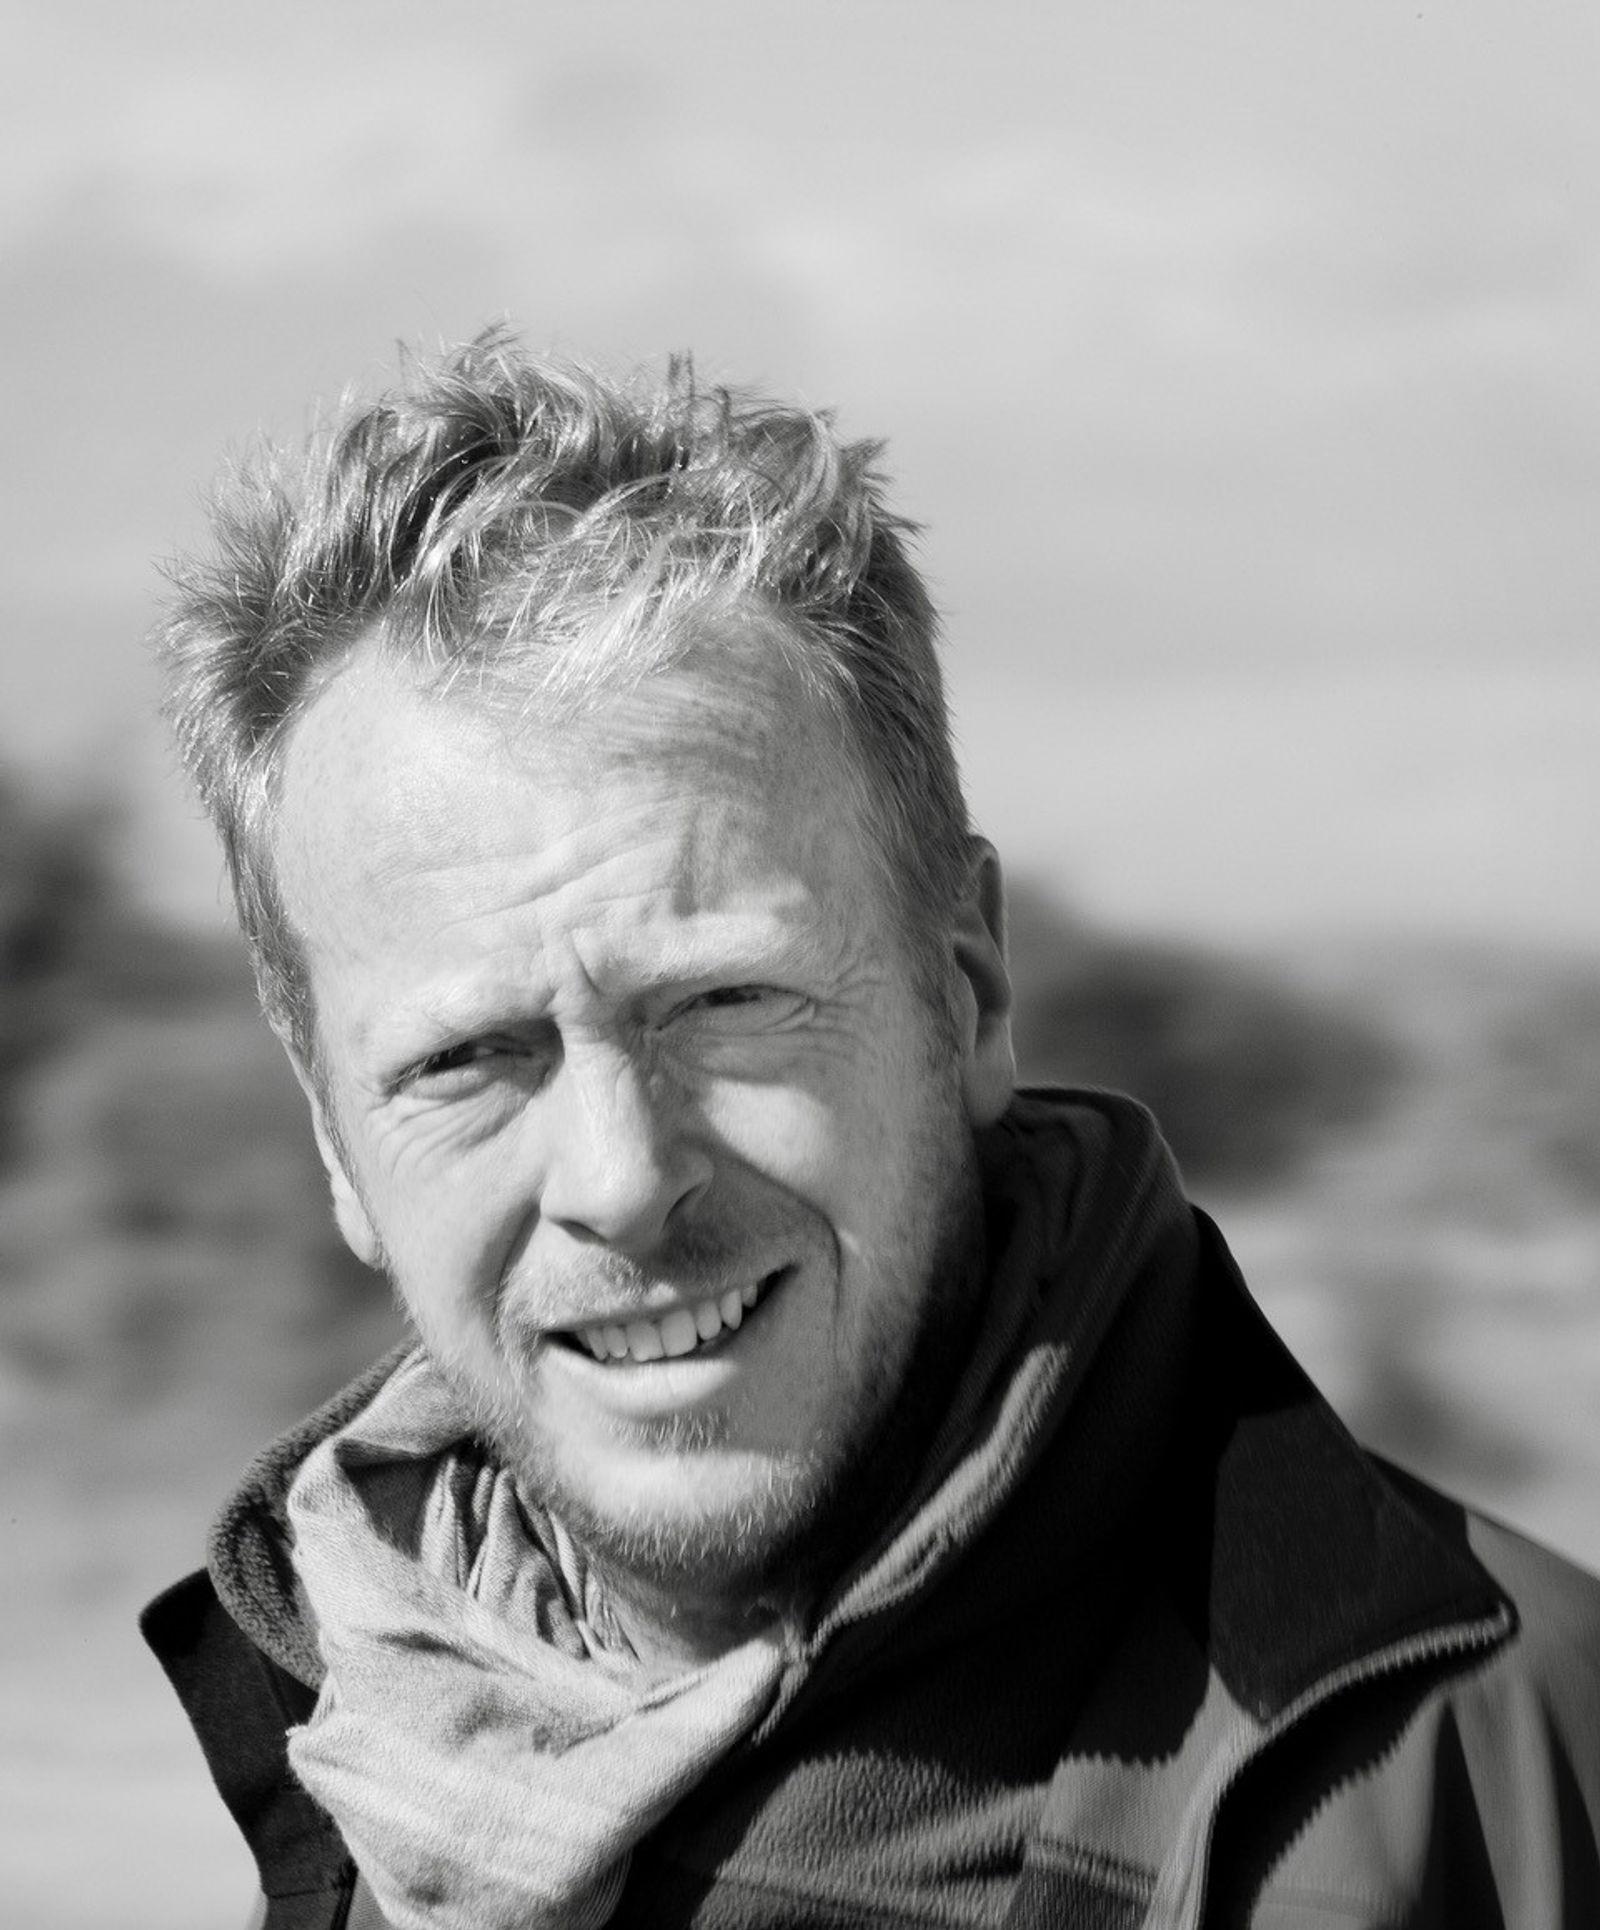 Philip Lee Harvey